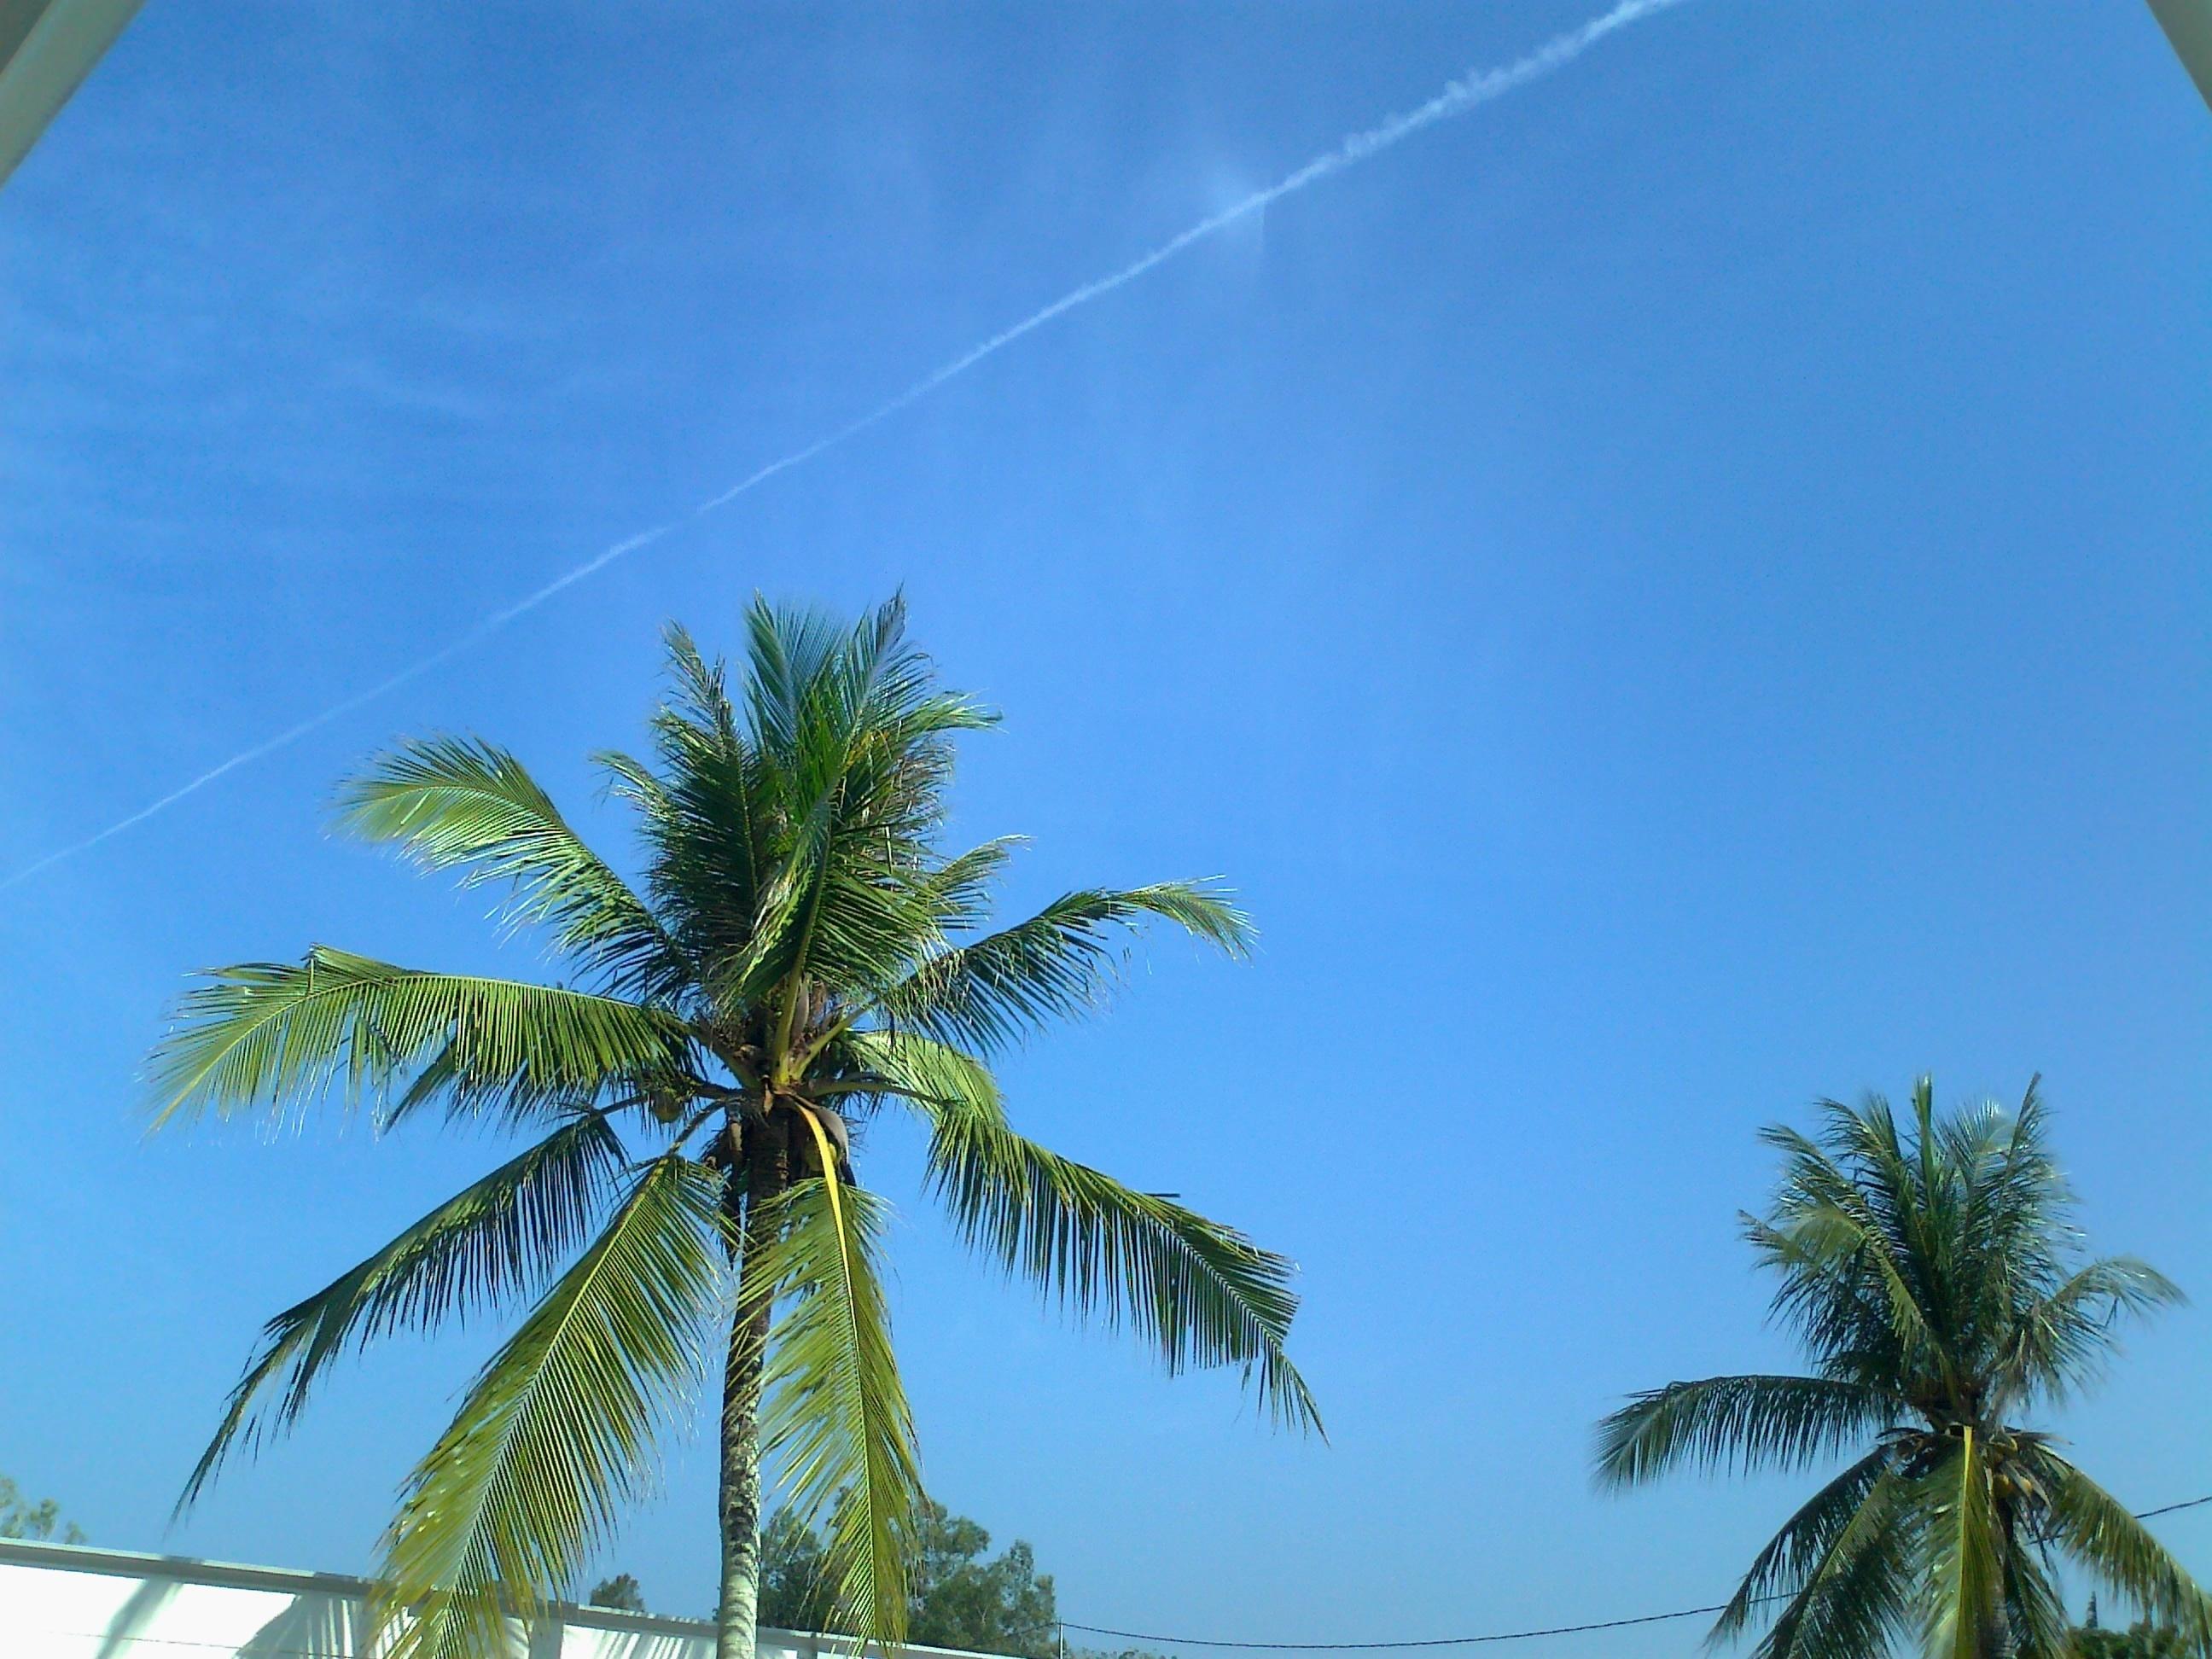 File:langit di palangkaraya pasca melintasnya pesawat tempur tni-au